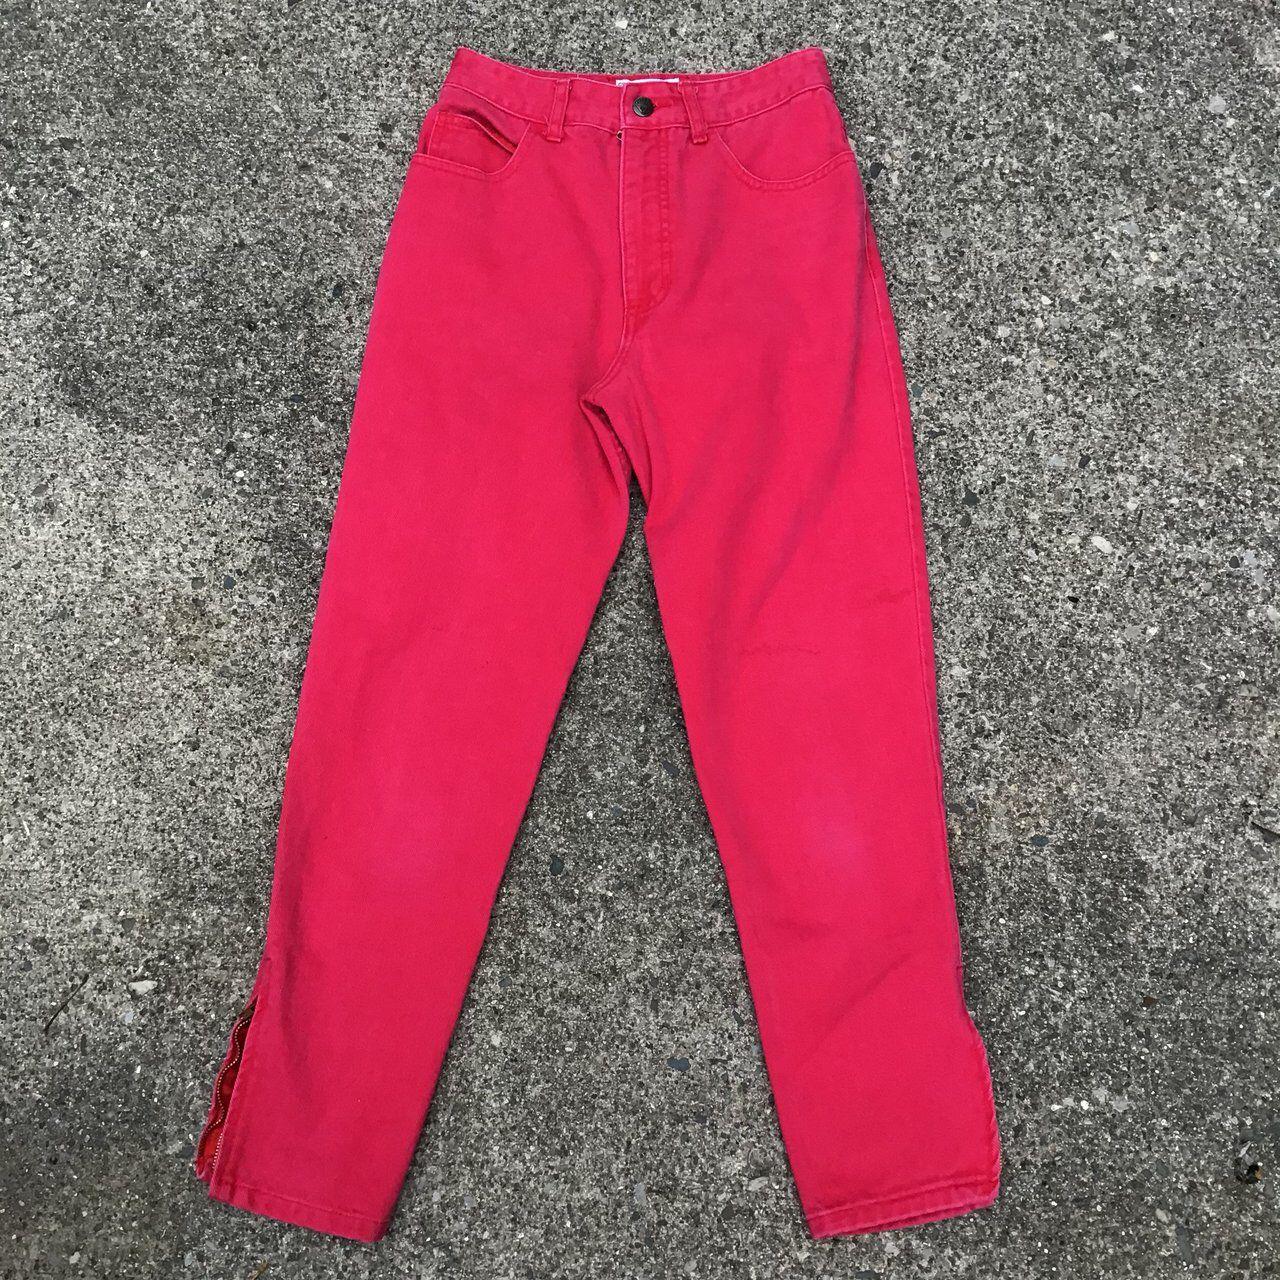 1e4f6533ff3 Listed on Depop by abbylyn | depop | Guess jeans, Depop, Jeans